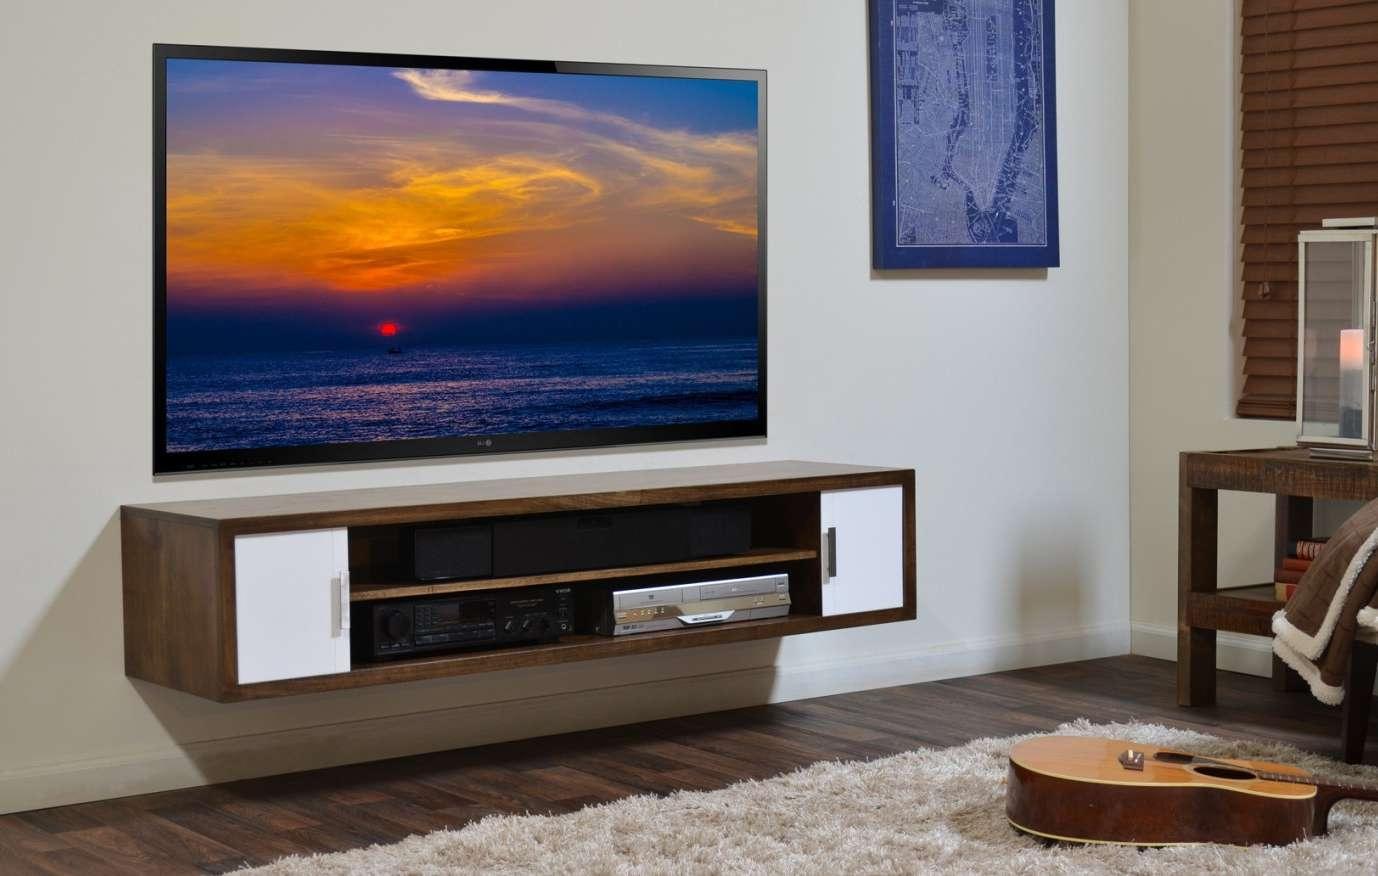 Tv : Single Shelf Tv Stands Amusing Single Shelf Wood Tv Stand For Single Shelf Tv Stands (View 4 of 15)